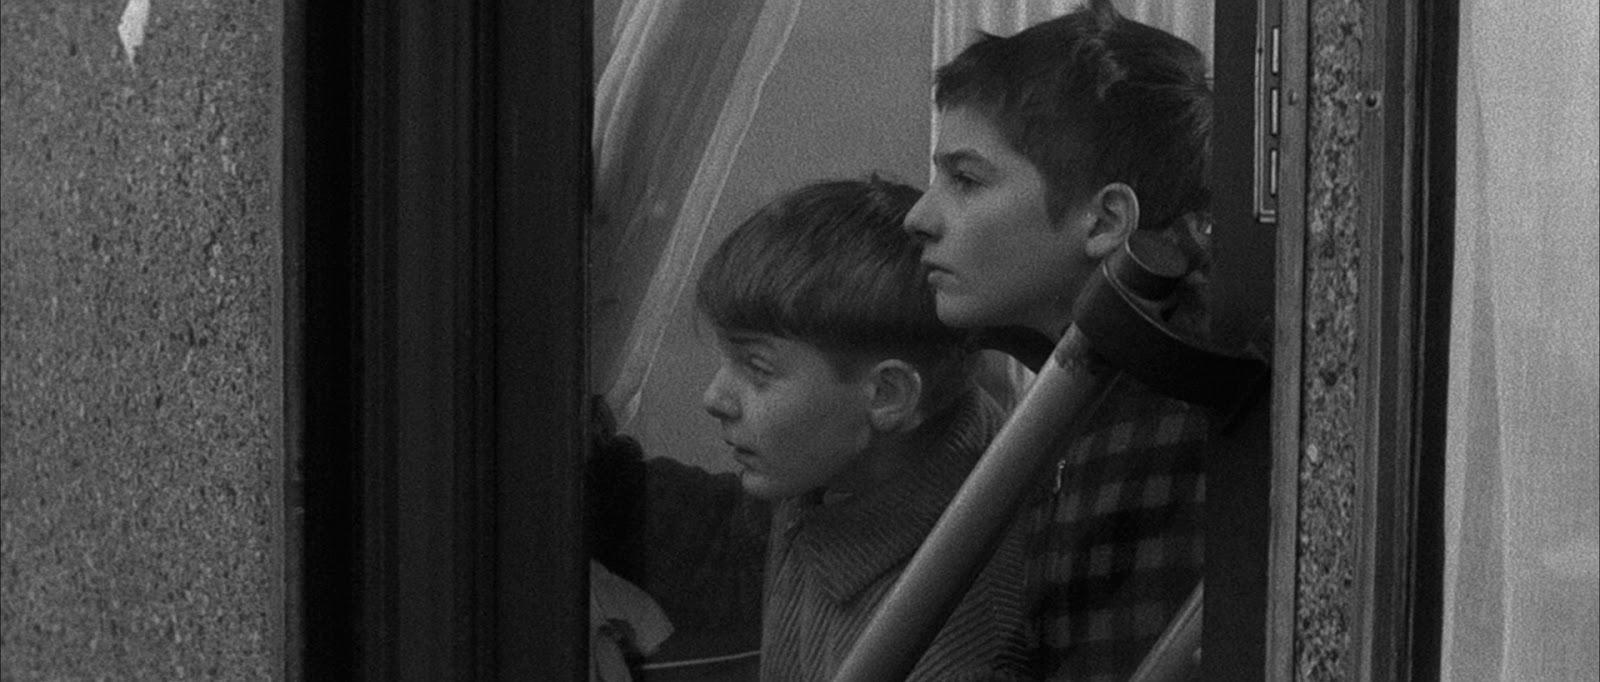 francois truffaut newwave film